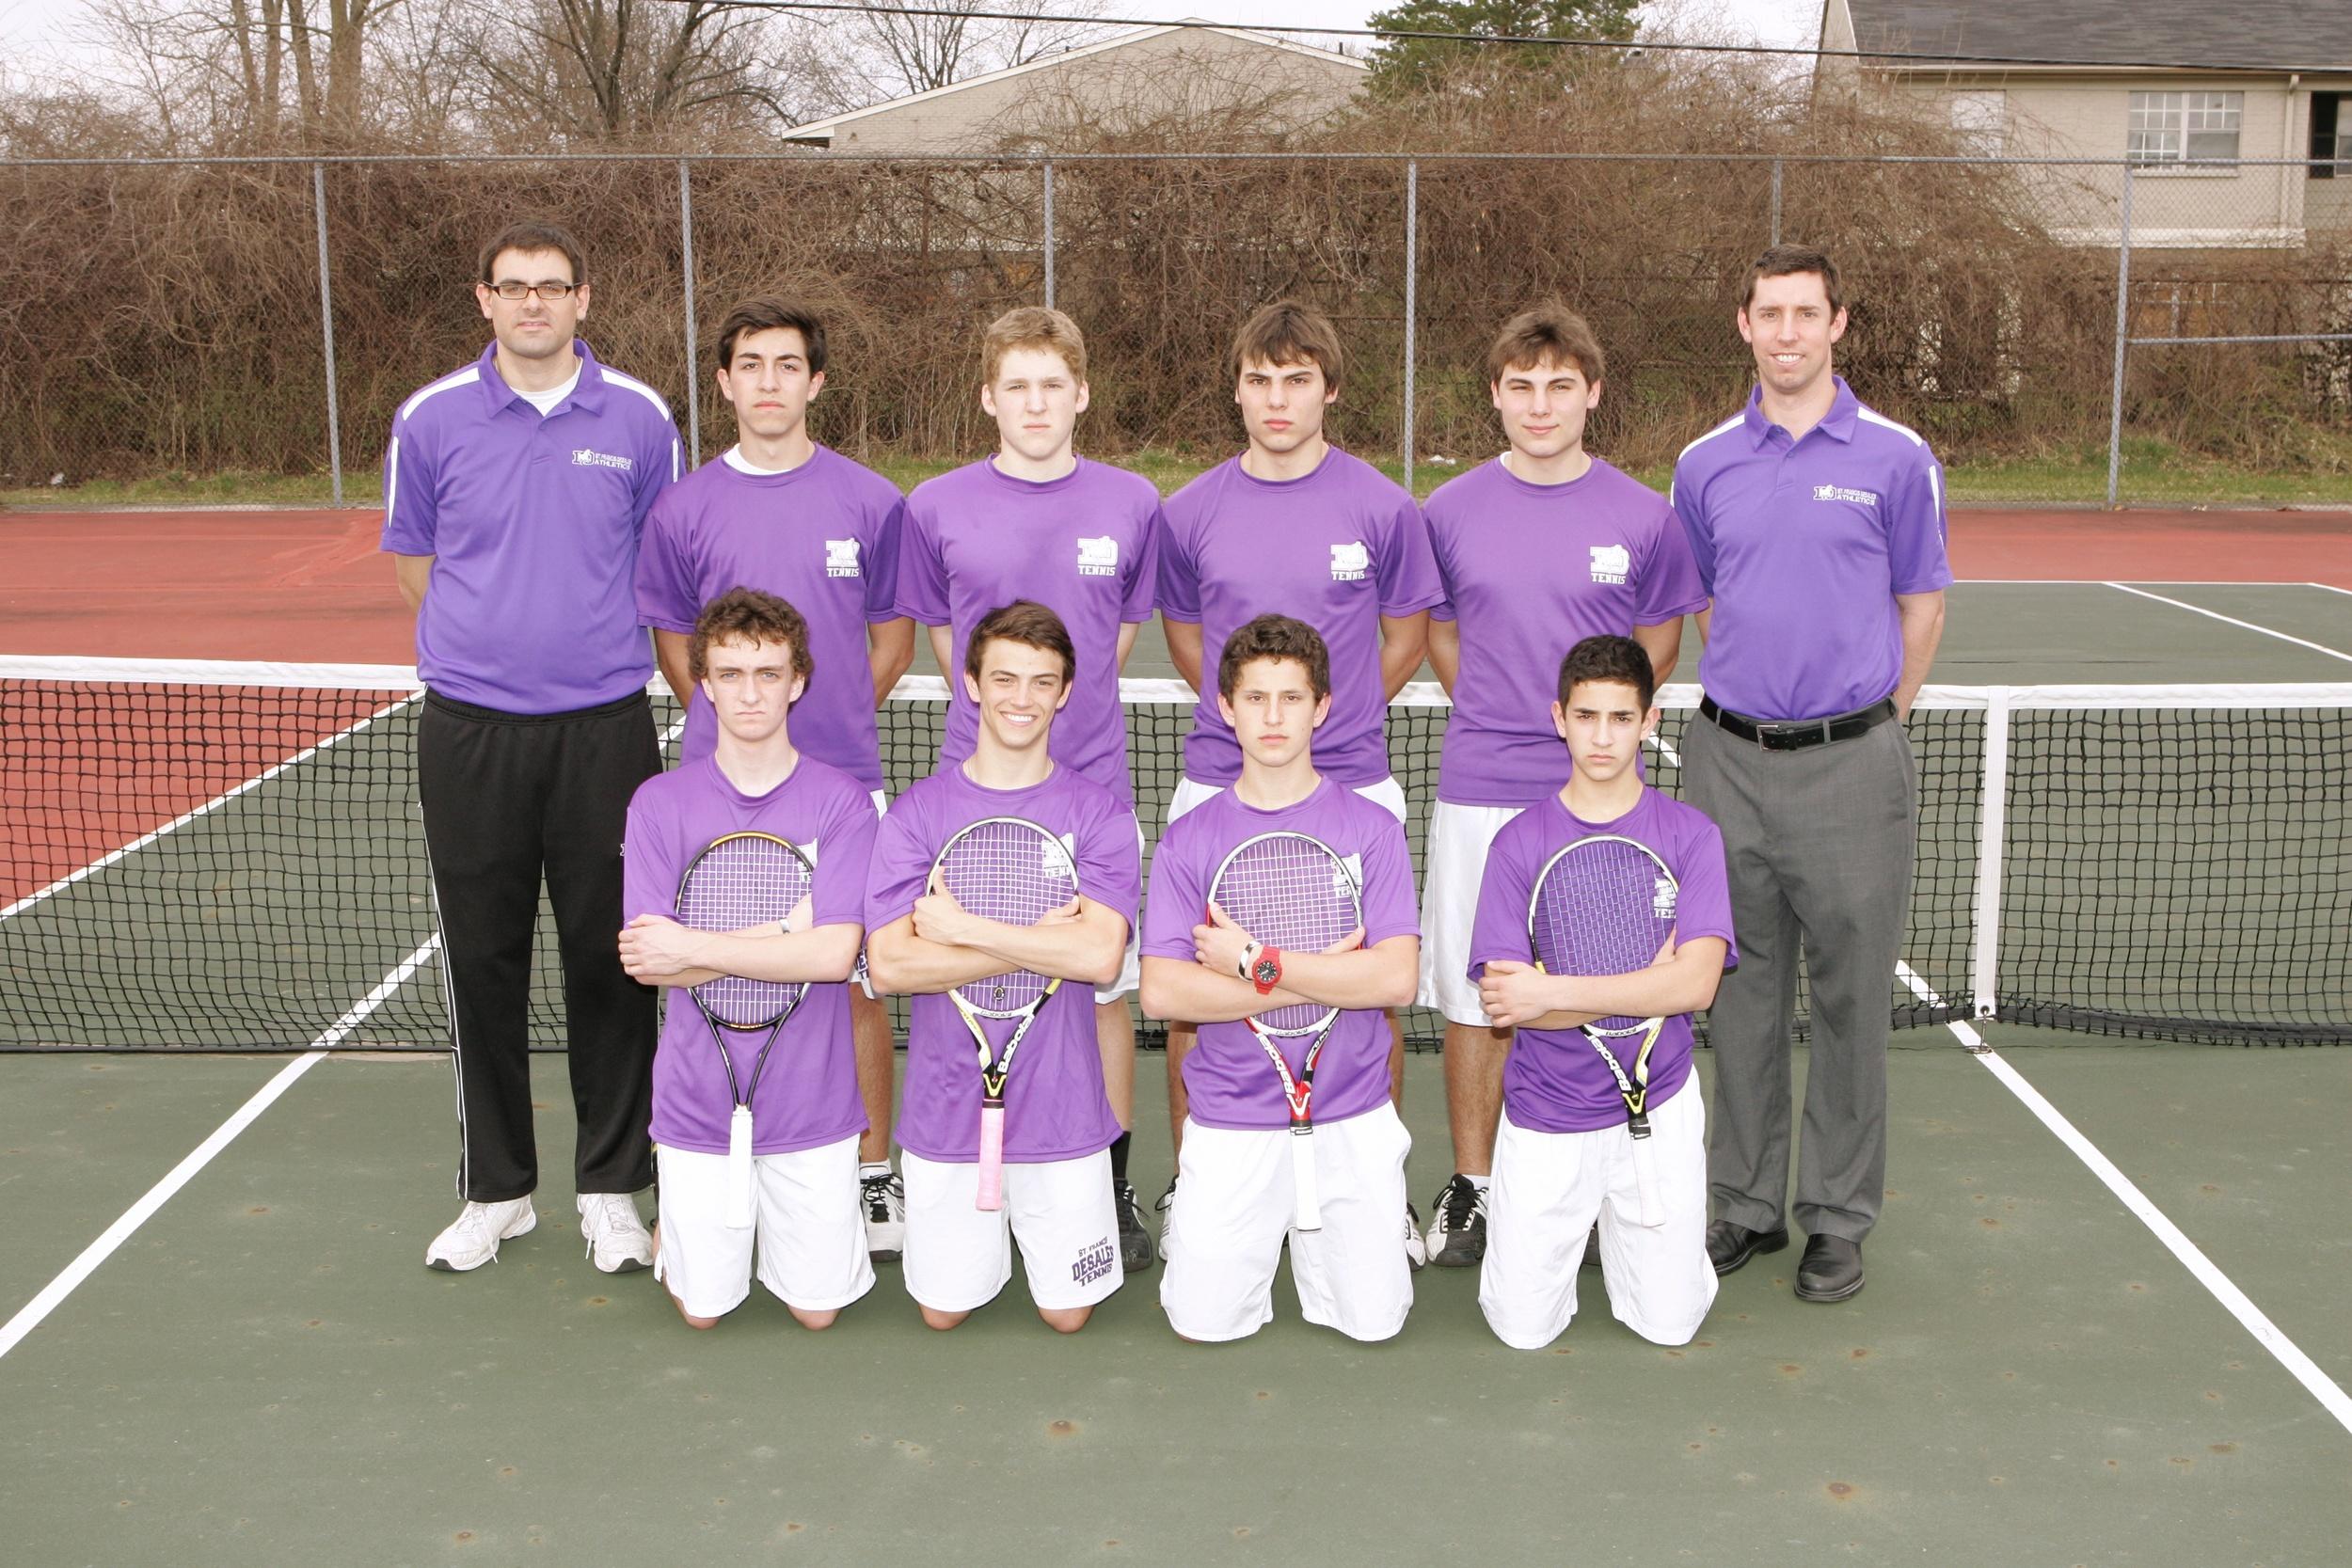 2012 CCL Champions